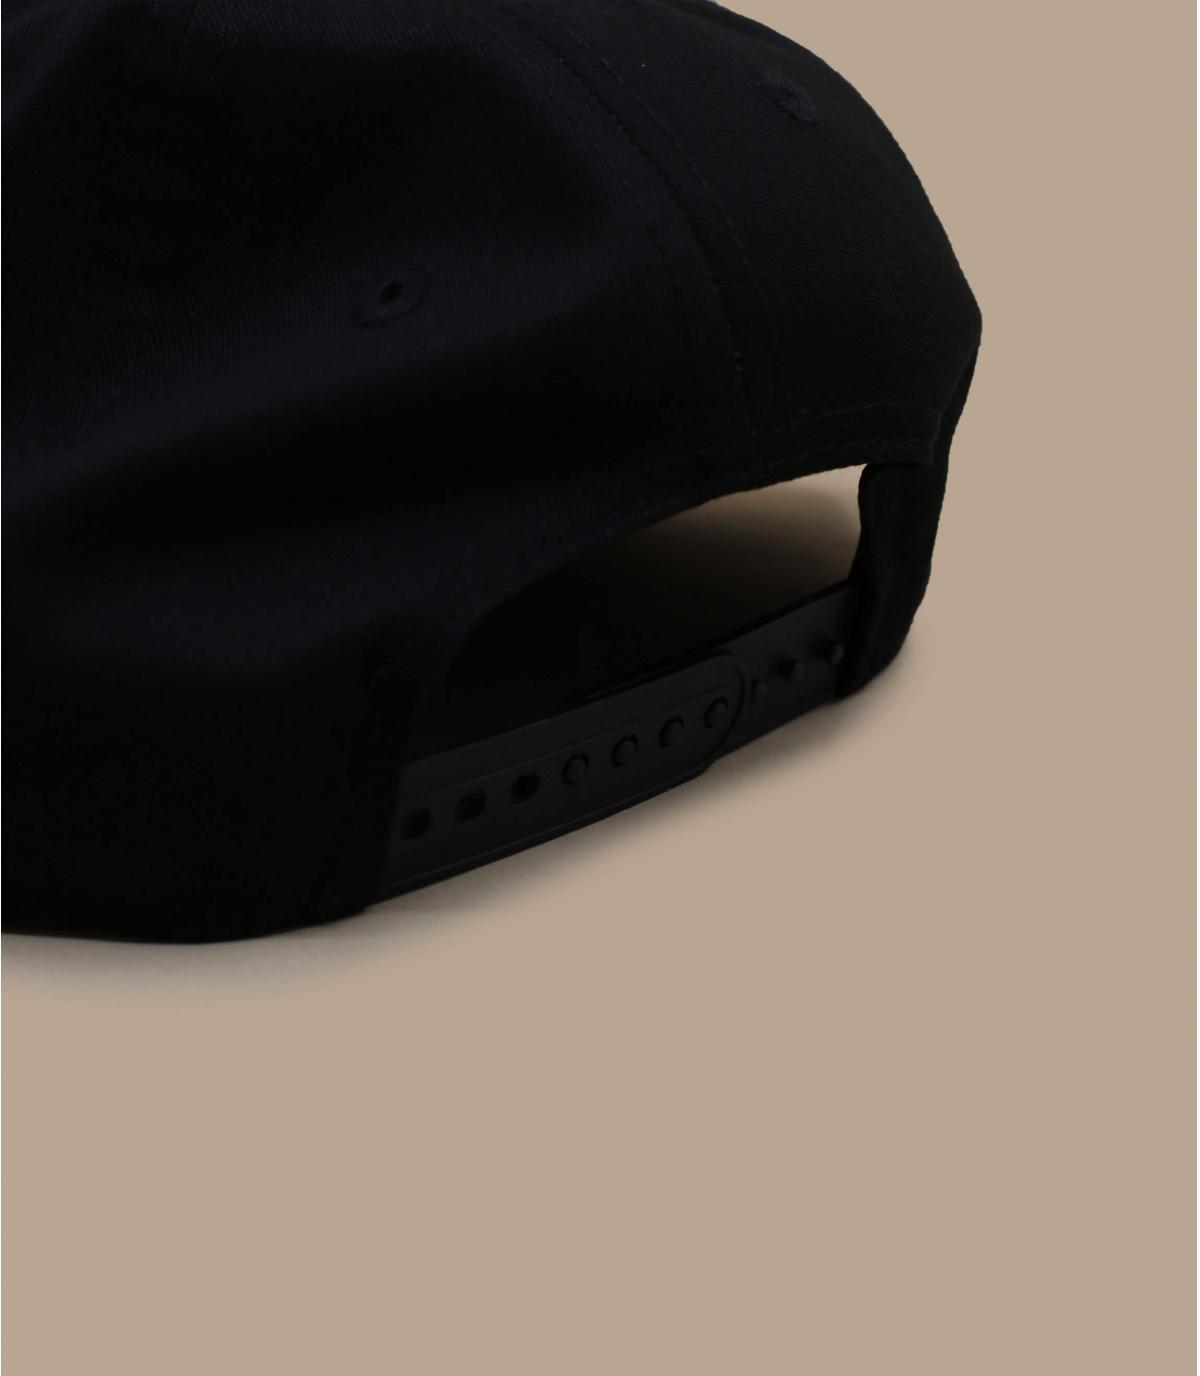 Détails Snapback NY MLB black black - image 4